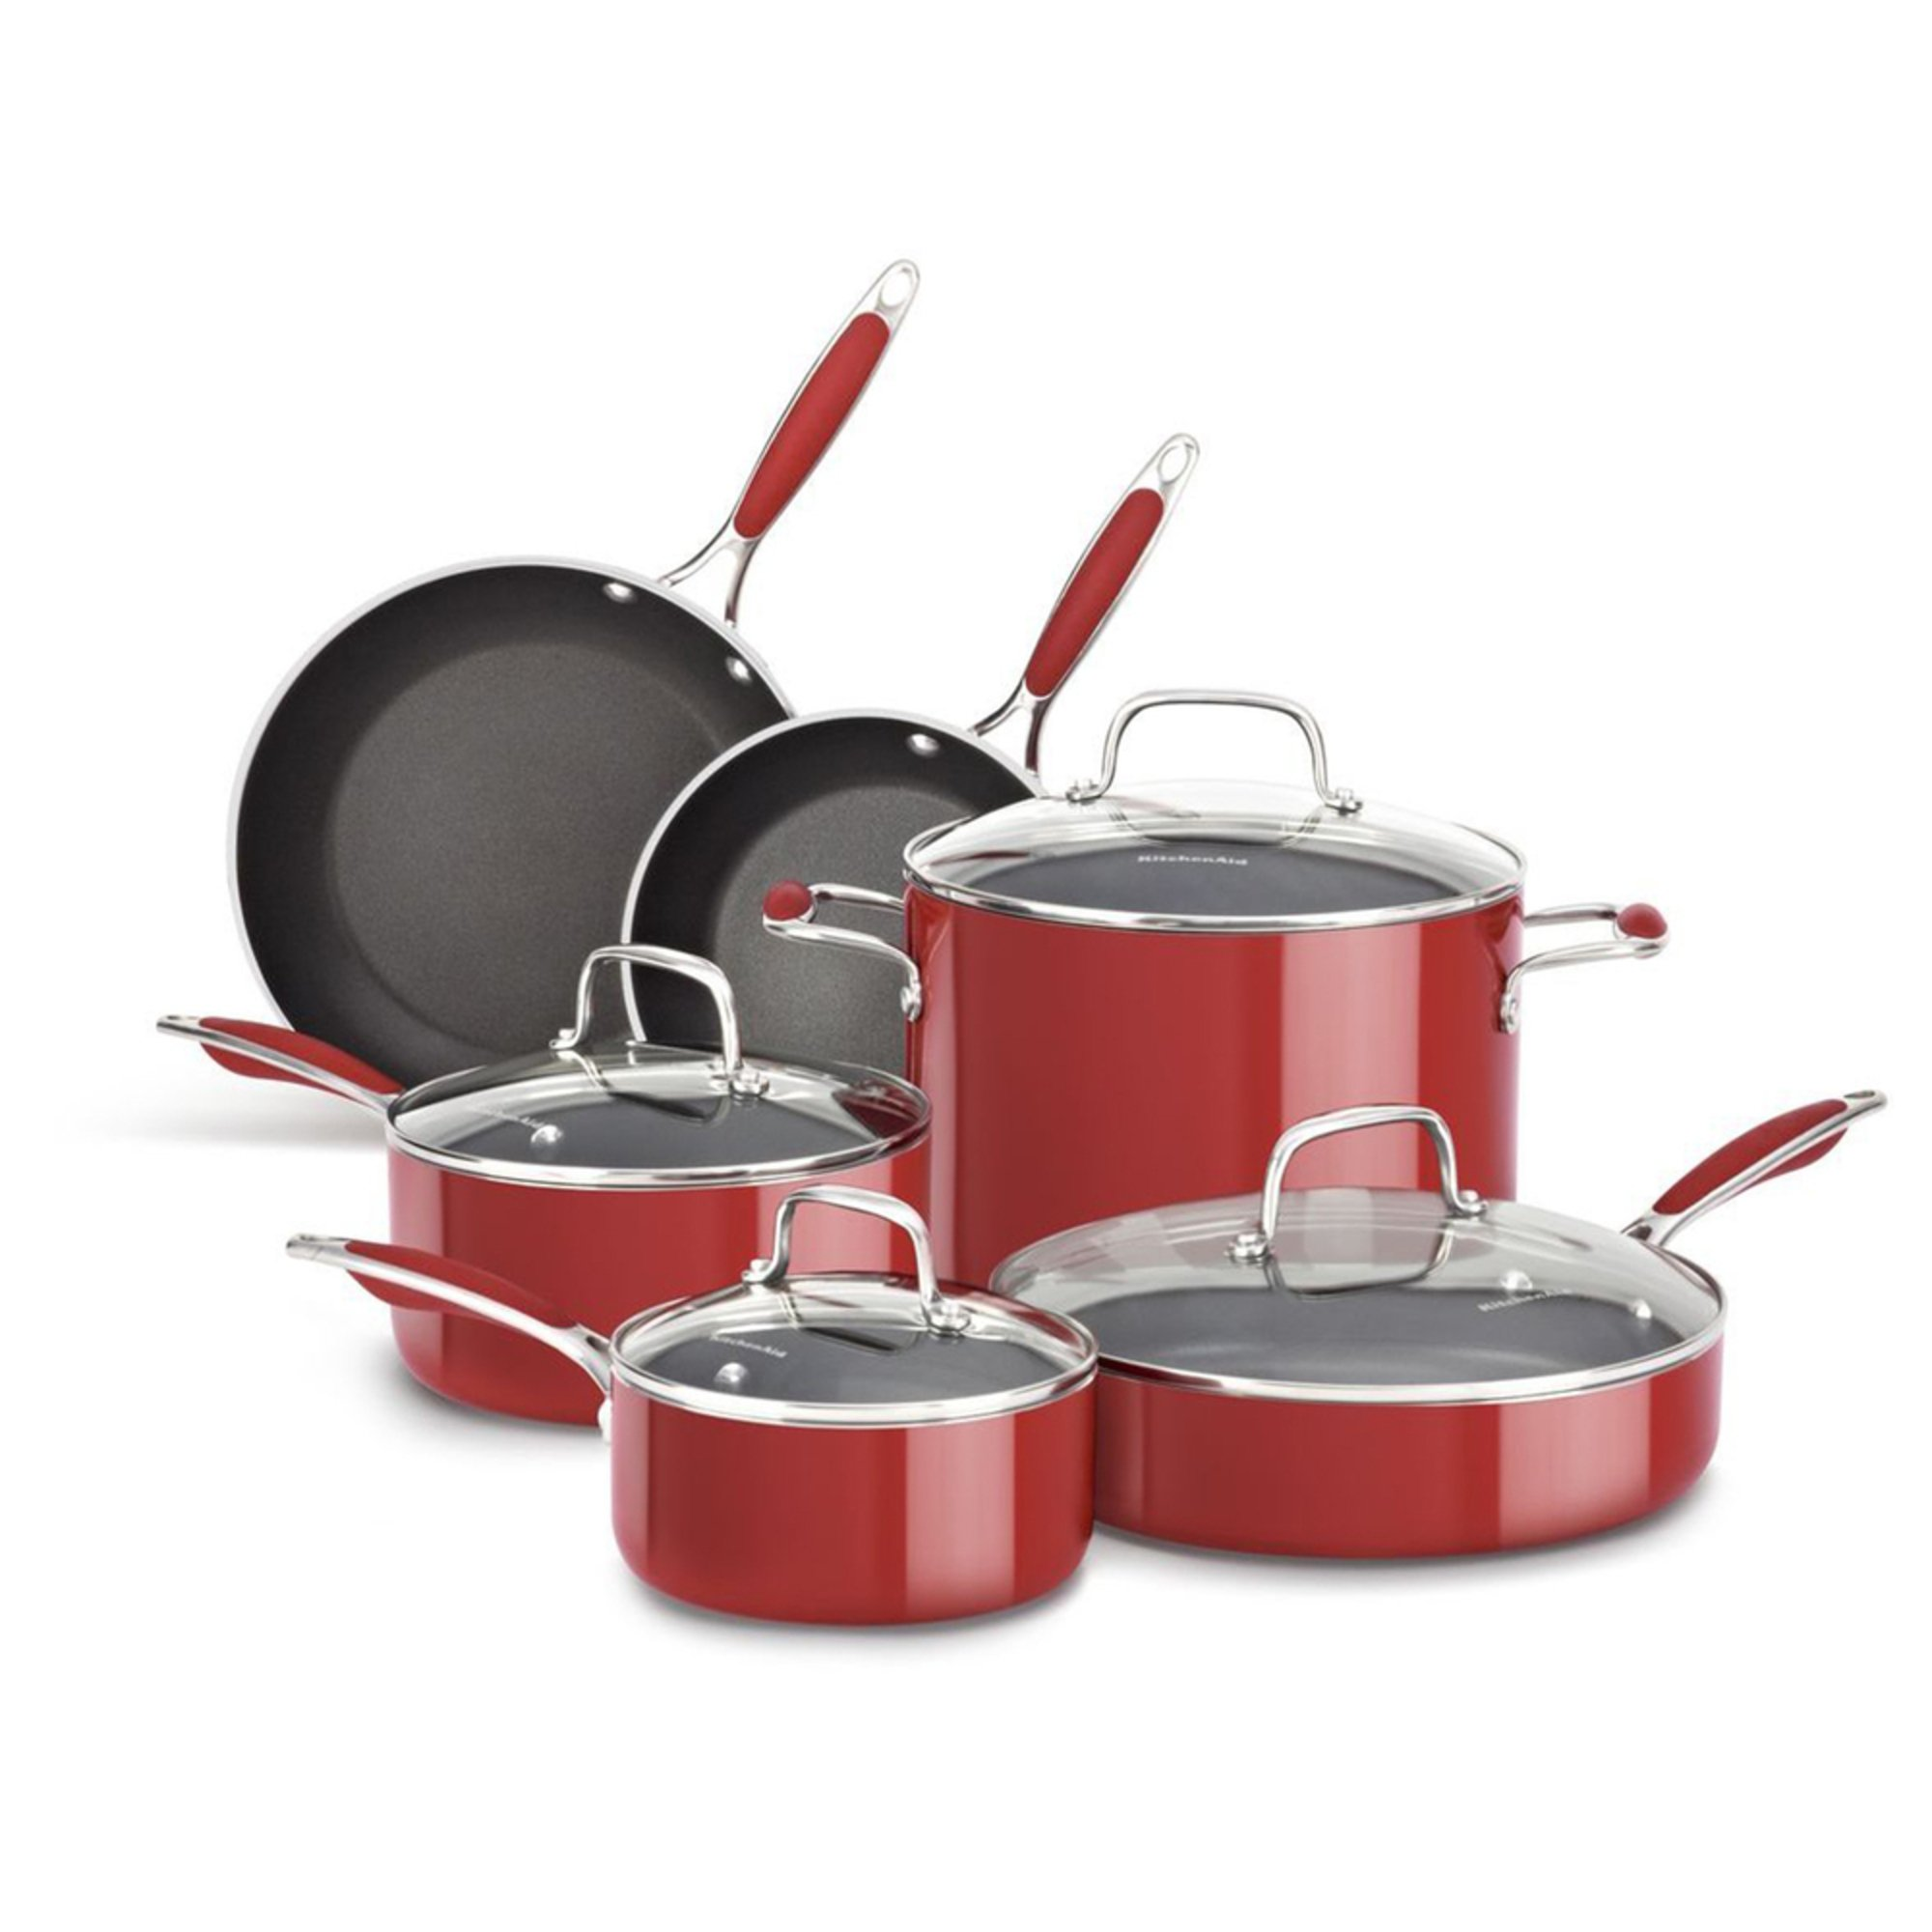 Kitchenaid Aluminum 10 Piece Cookware Set Empire Red Search